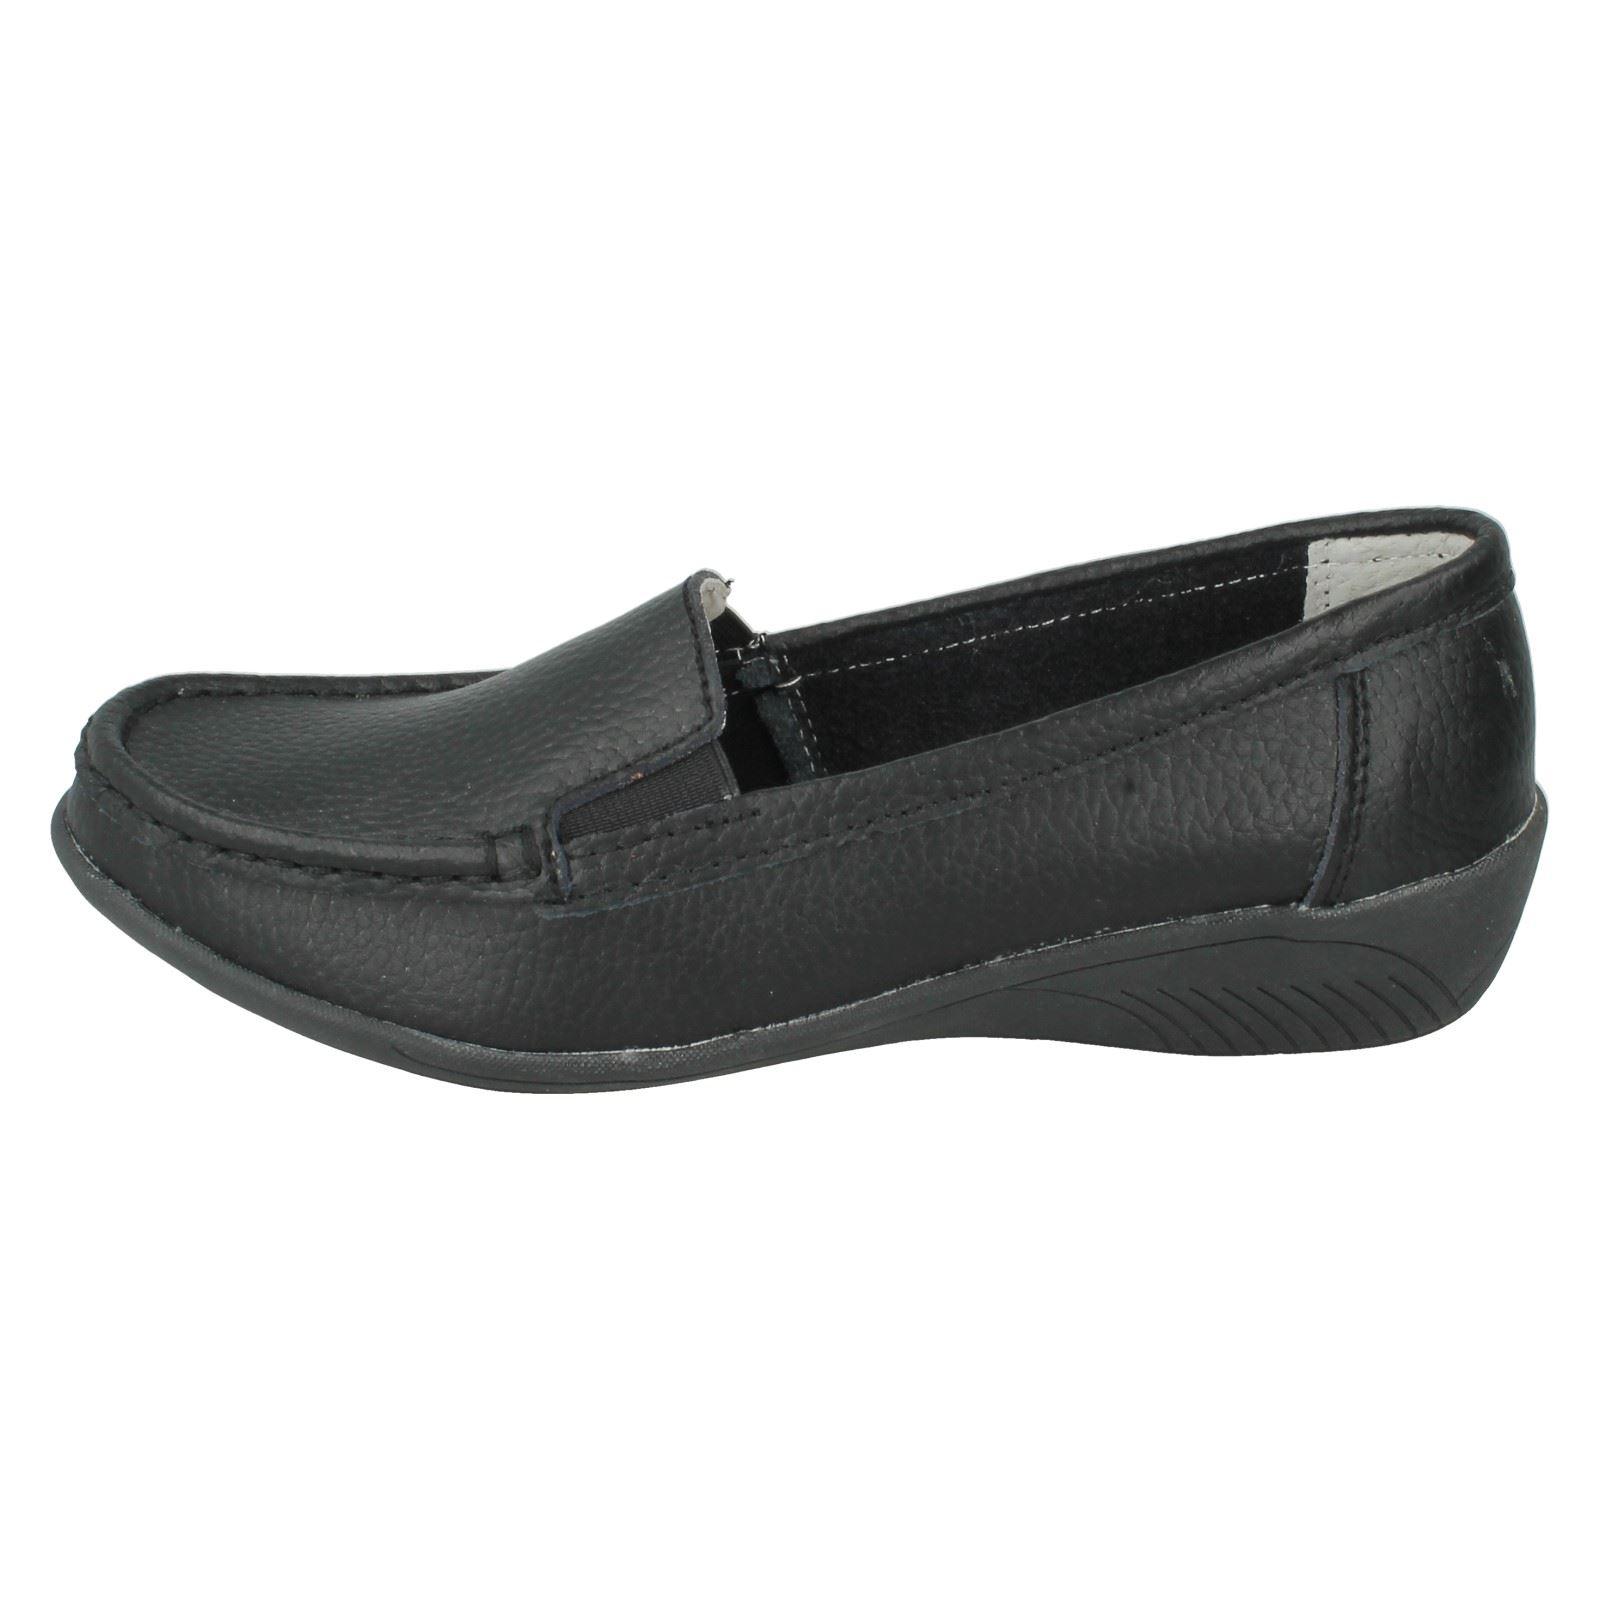 Damen Eaze Flache Schuhe F3092